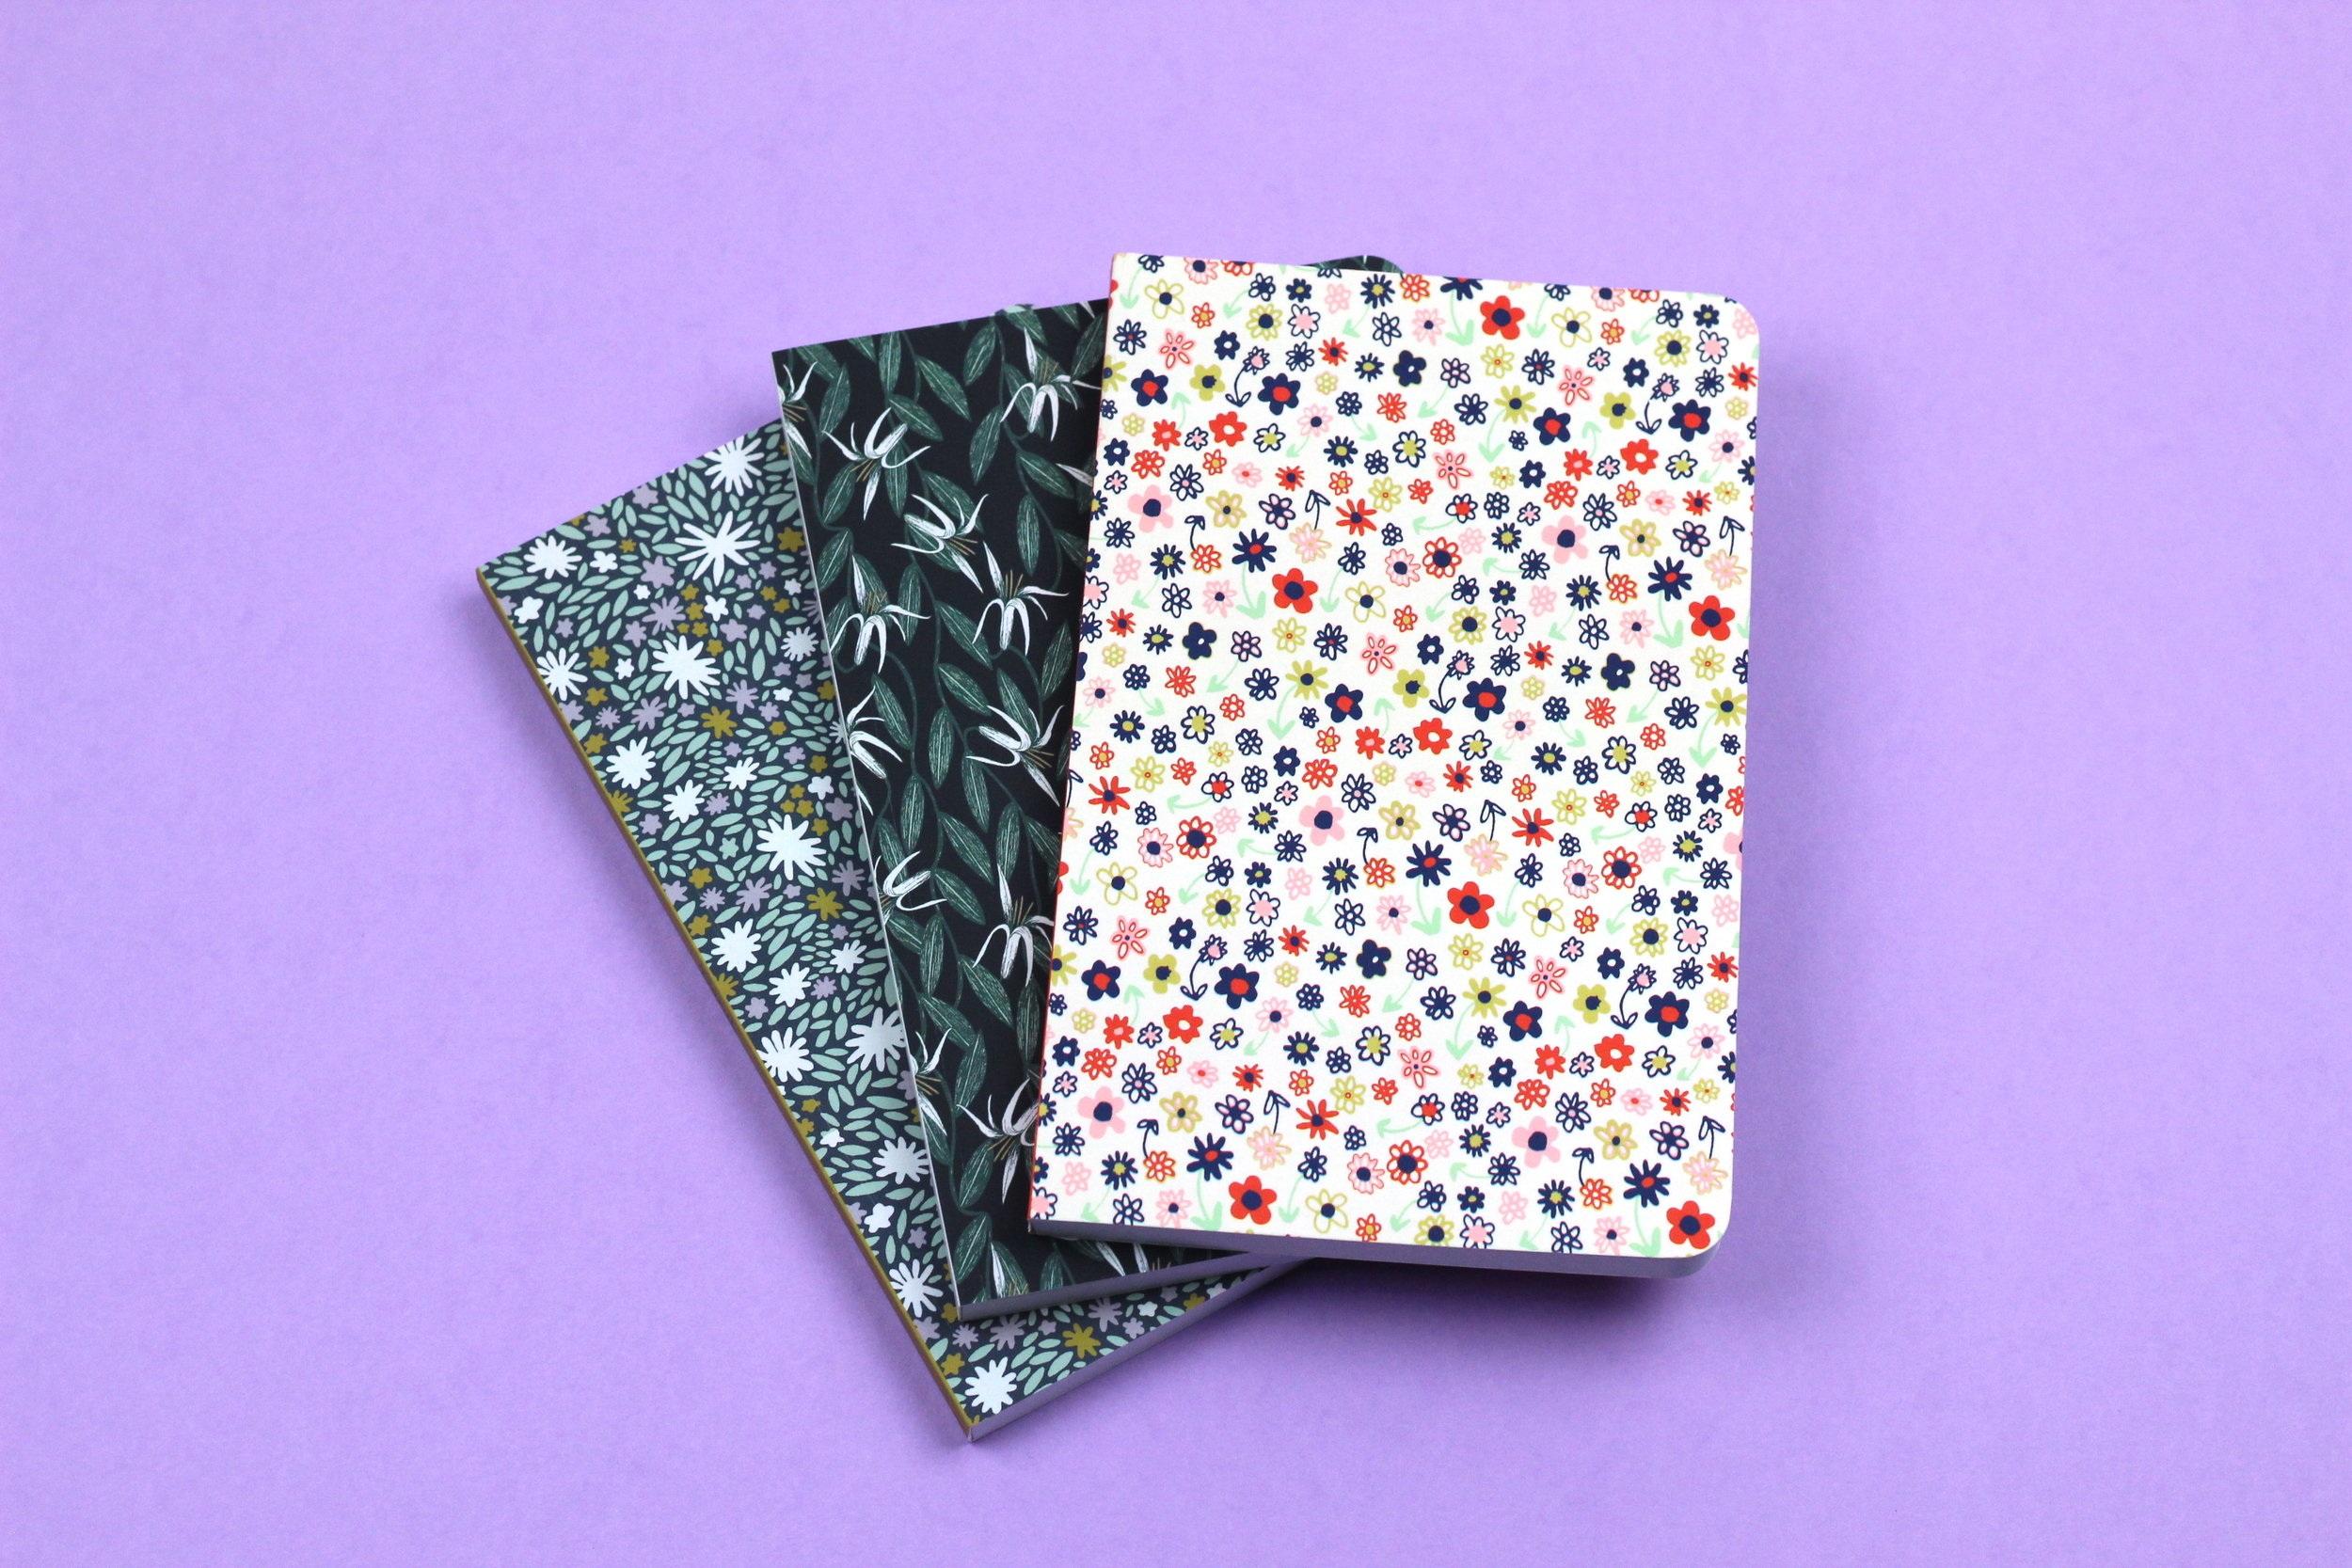 Caitlin Foster x Denik - Original print design for notebook company Denik.